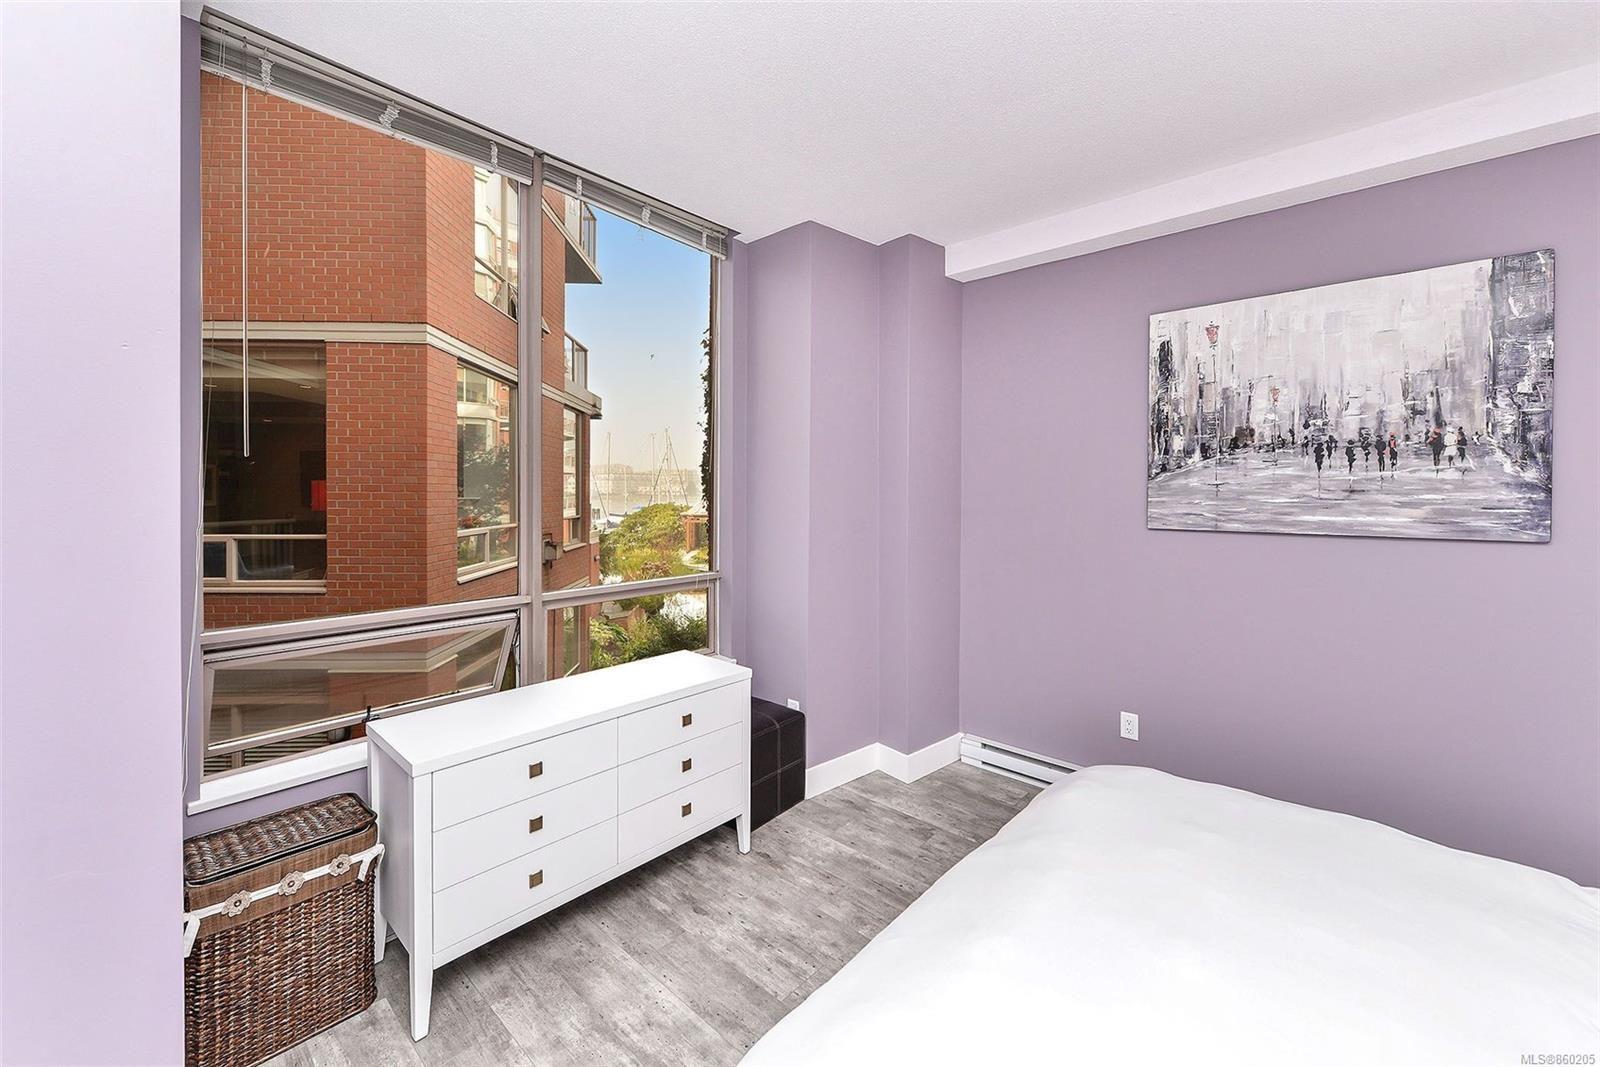 Photo 27: Photos: 204 630 Montreal St in : Vi James Bay Condo for sale (Victoria)  : MLS®# 860205